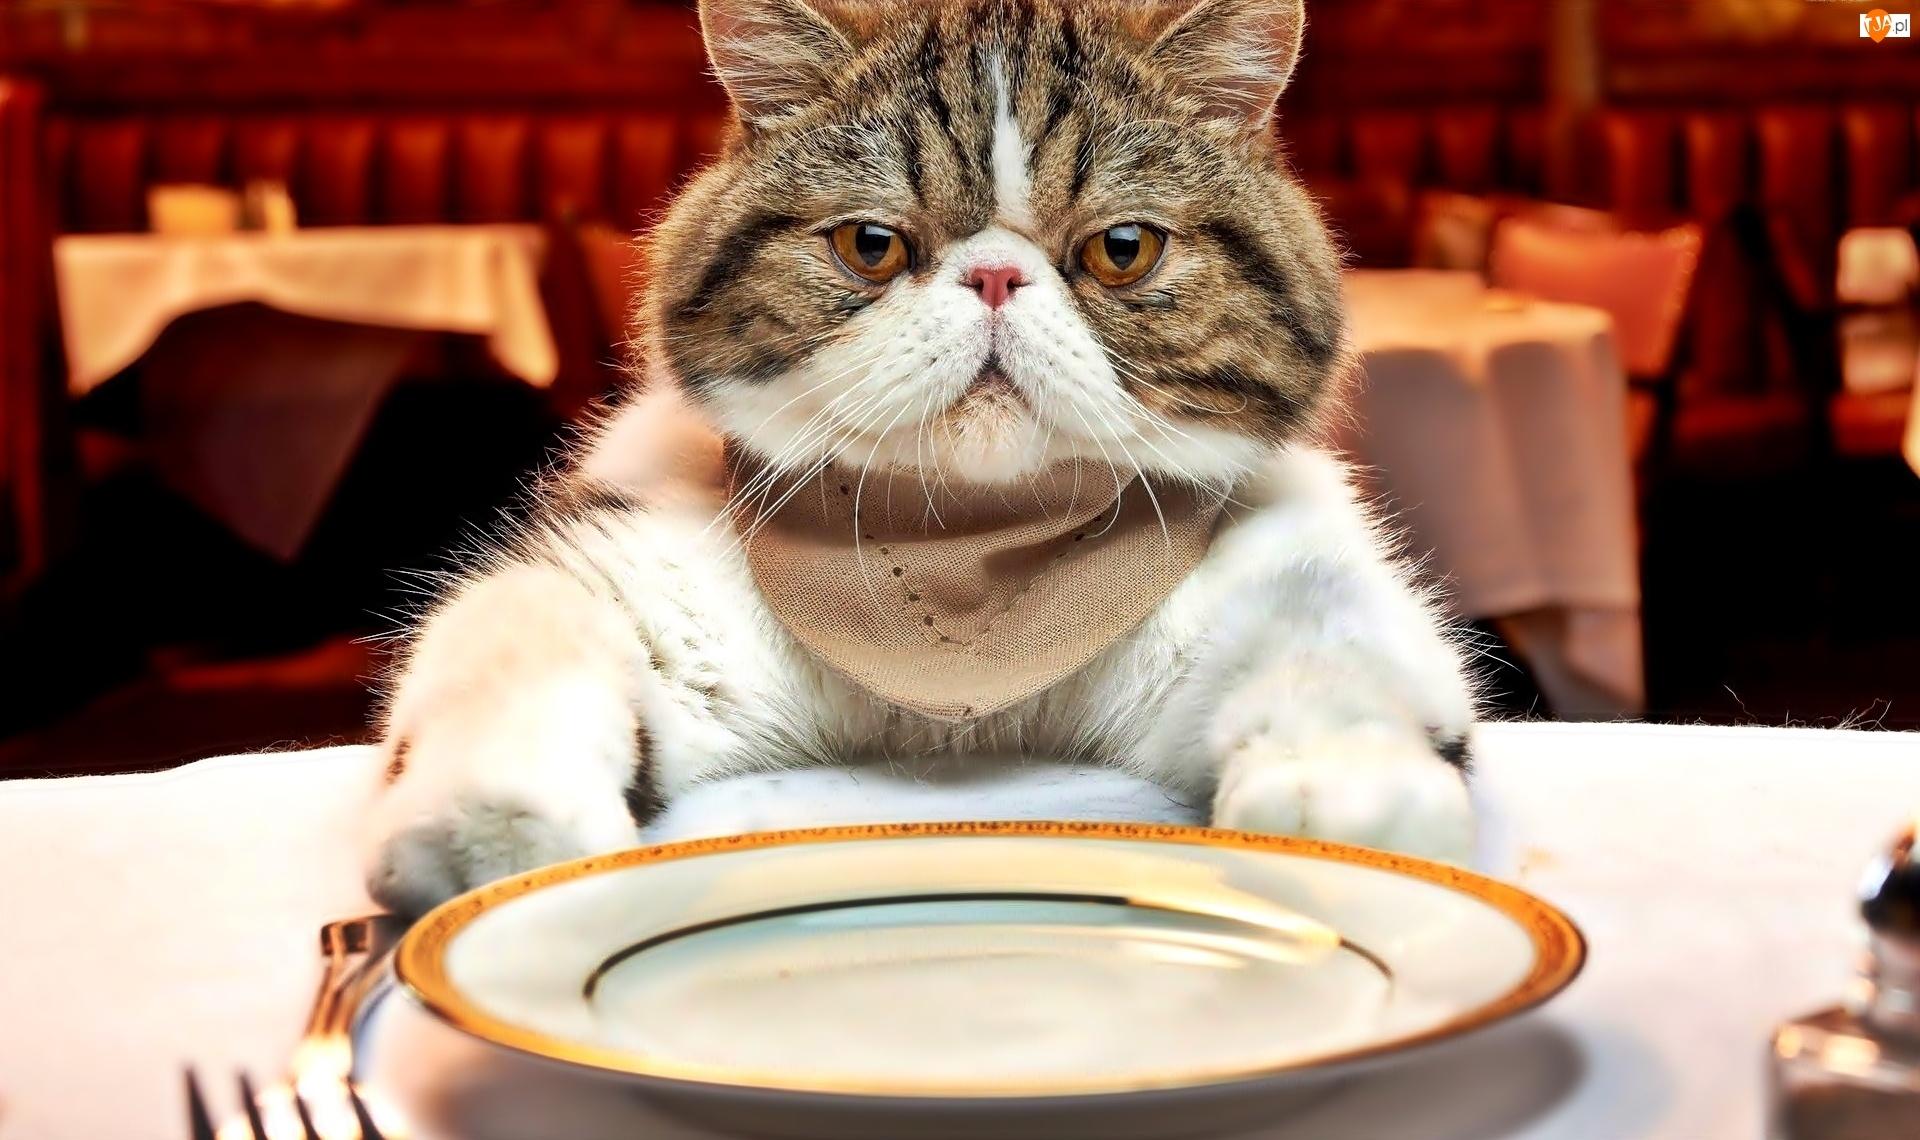 Stół, Kot, Talerz